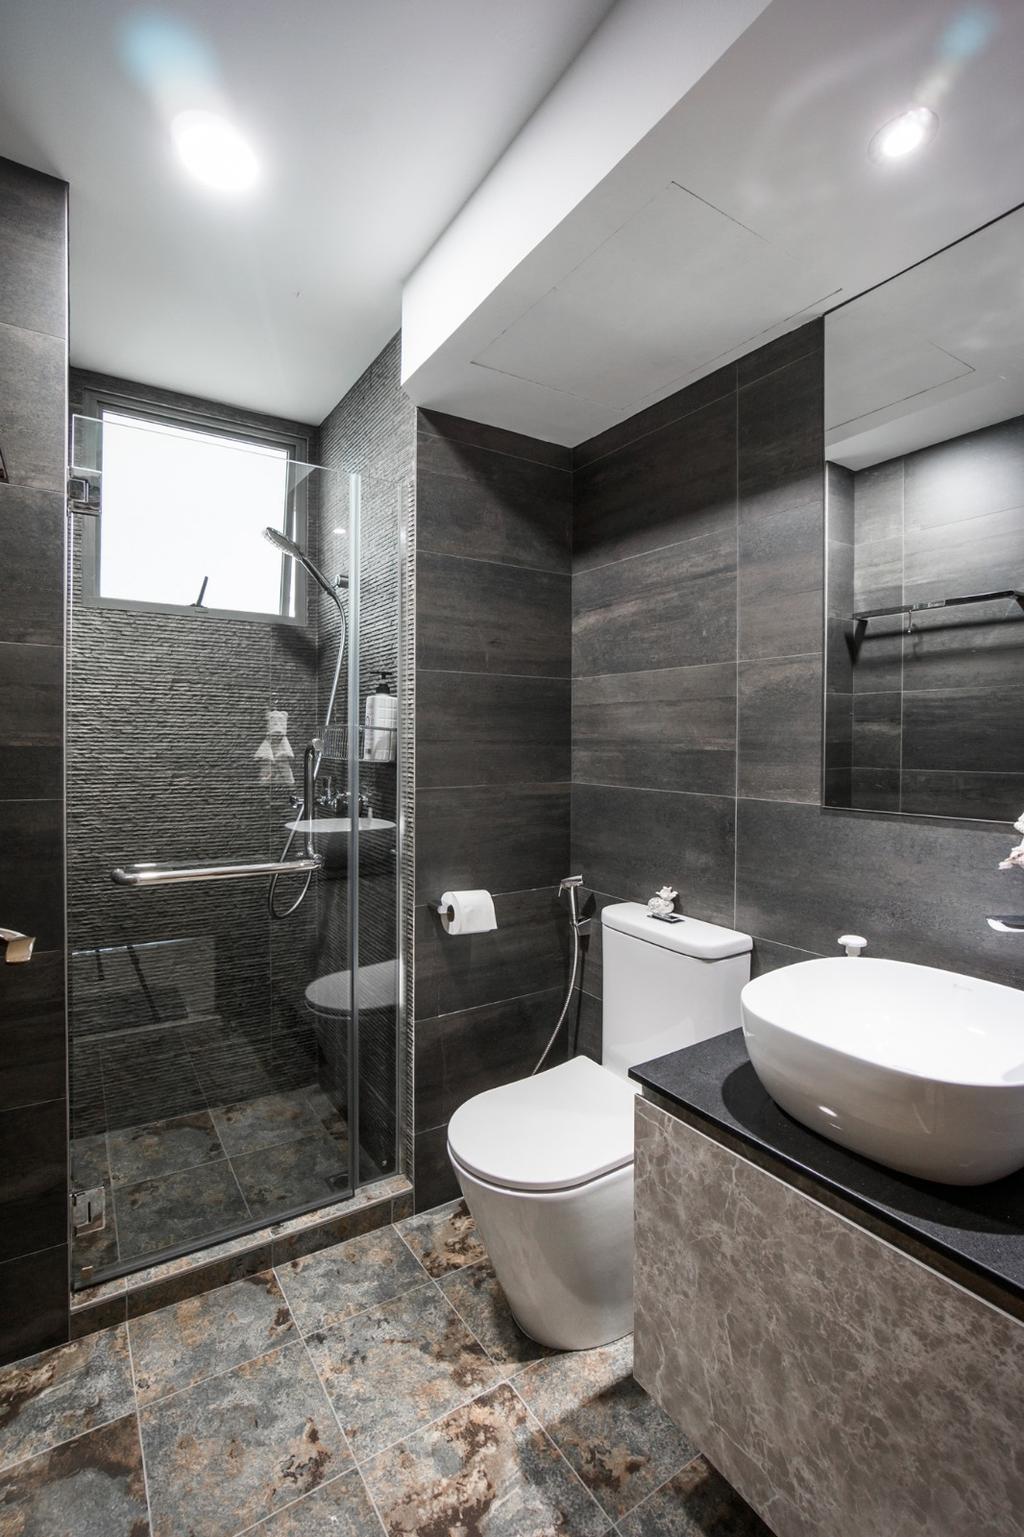 Transitional, Condo, Bathroom, Palm Gardens, Interior Designer, Flo Design, Indoors, Interior Design, Room, Sink